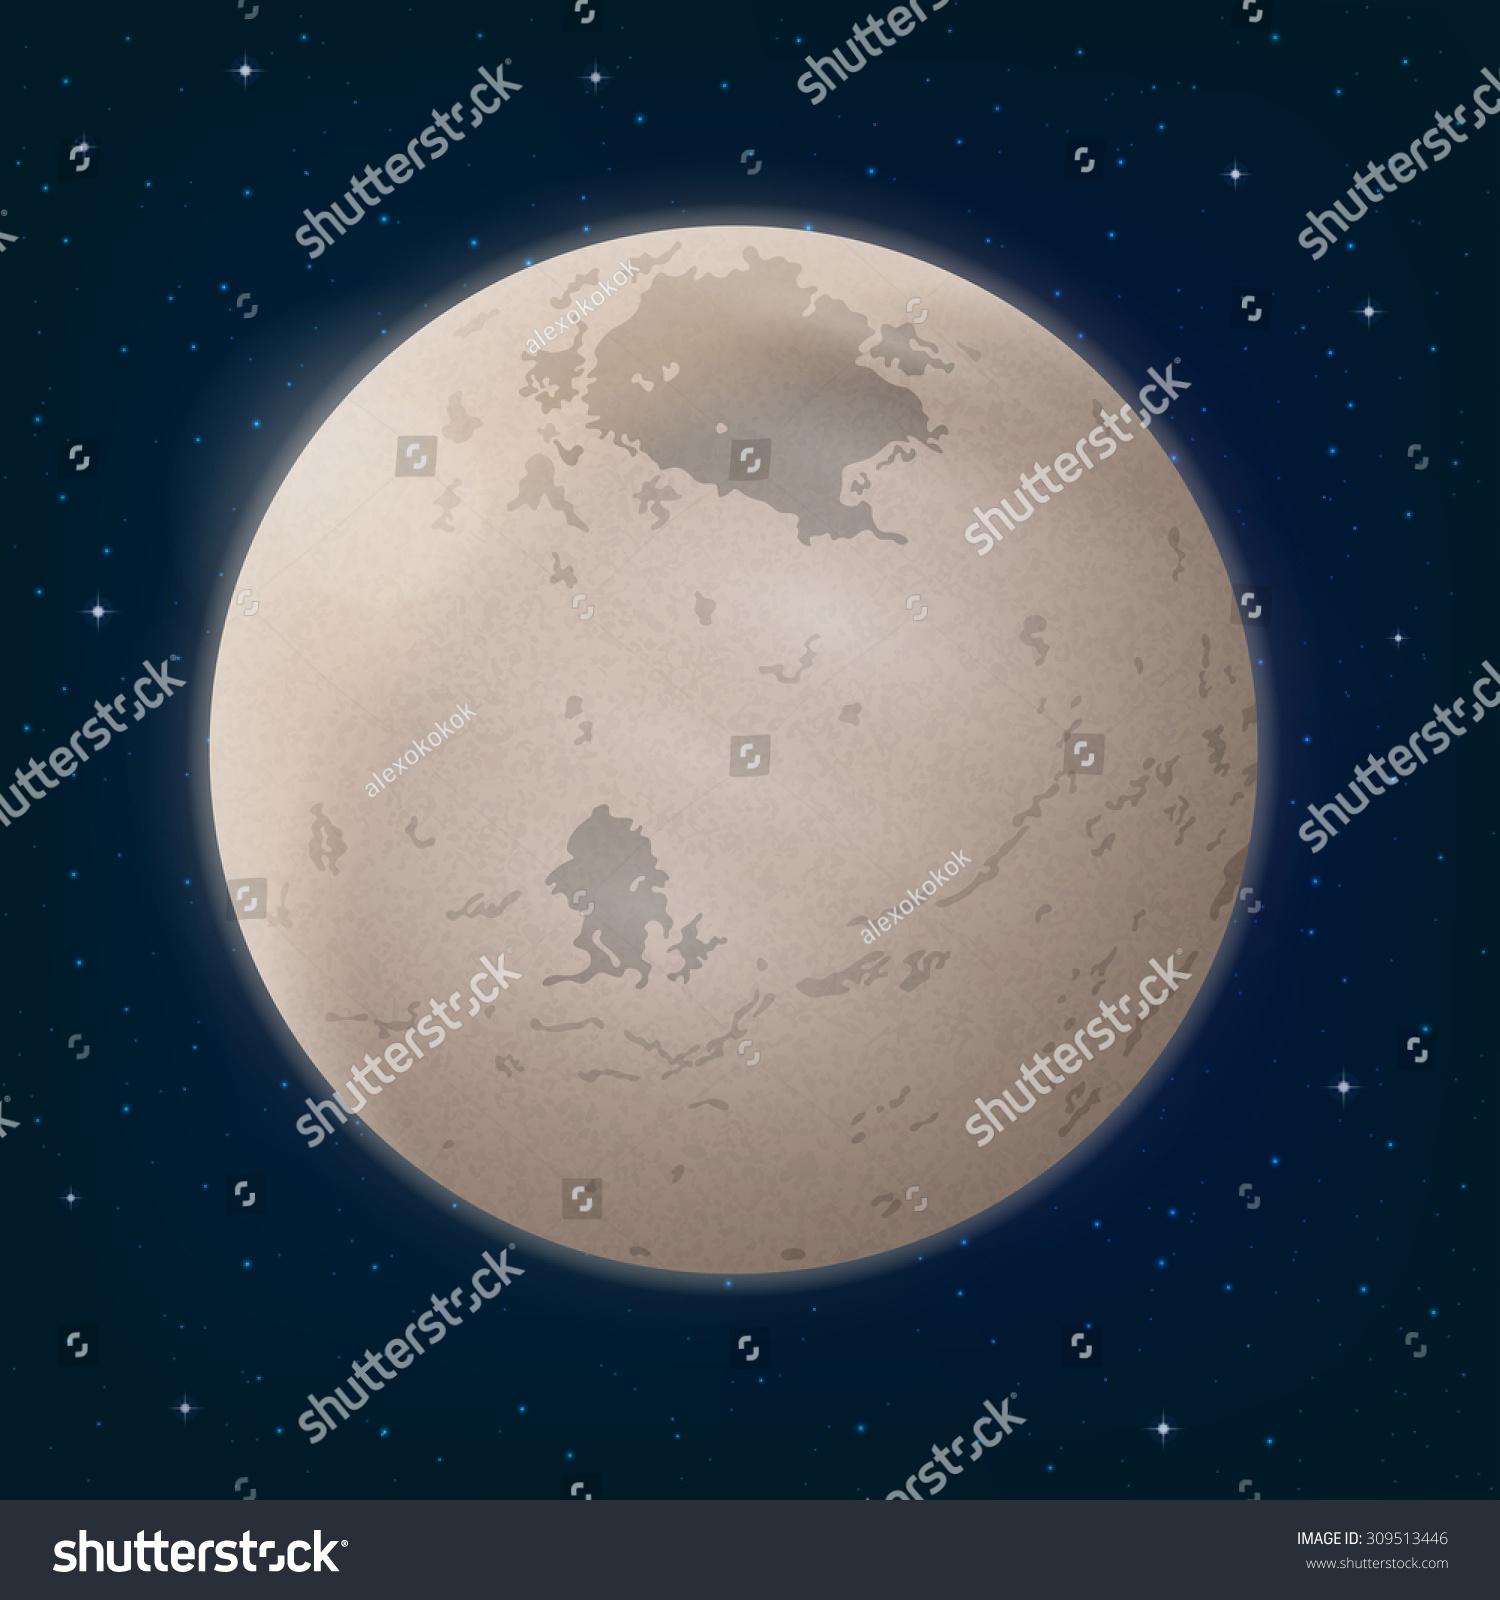 elements present on planet pluto - photo #31